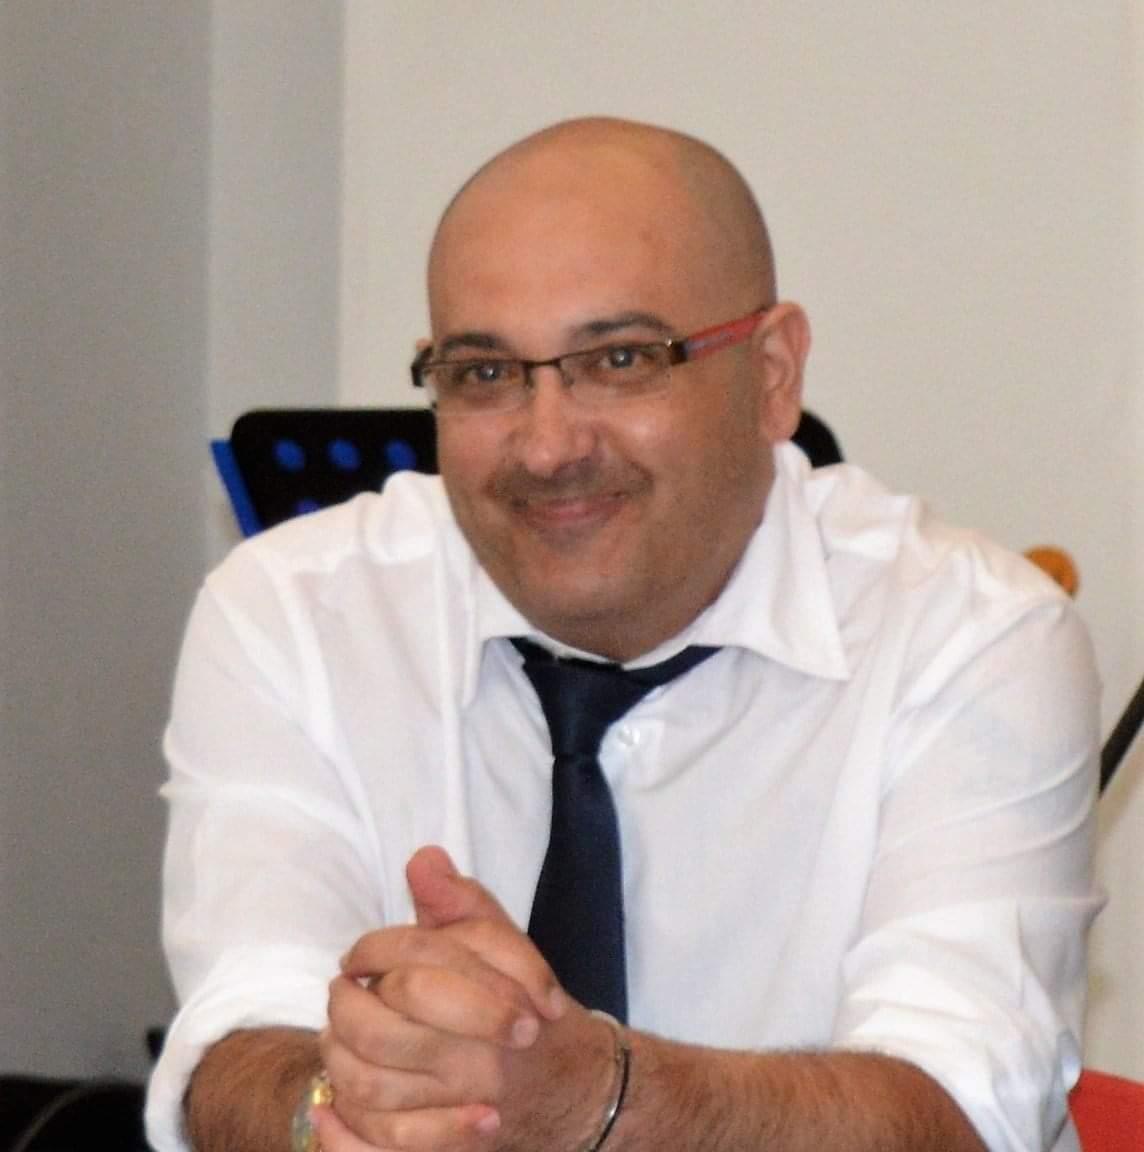 Maurizio Inturri